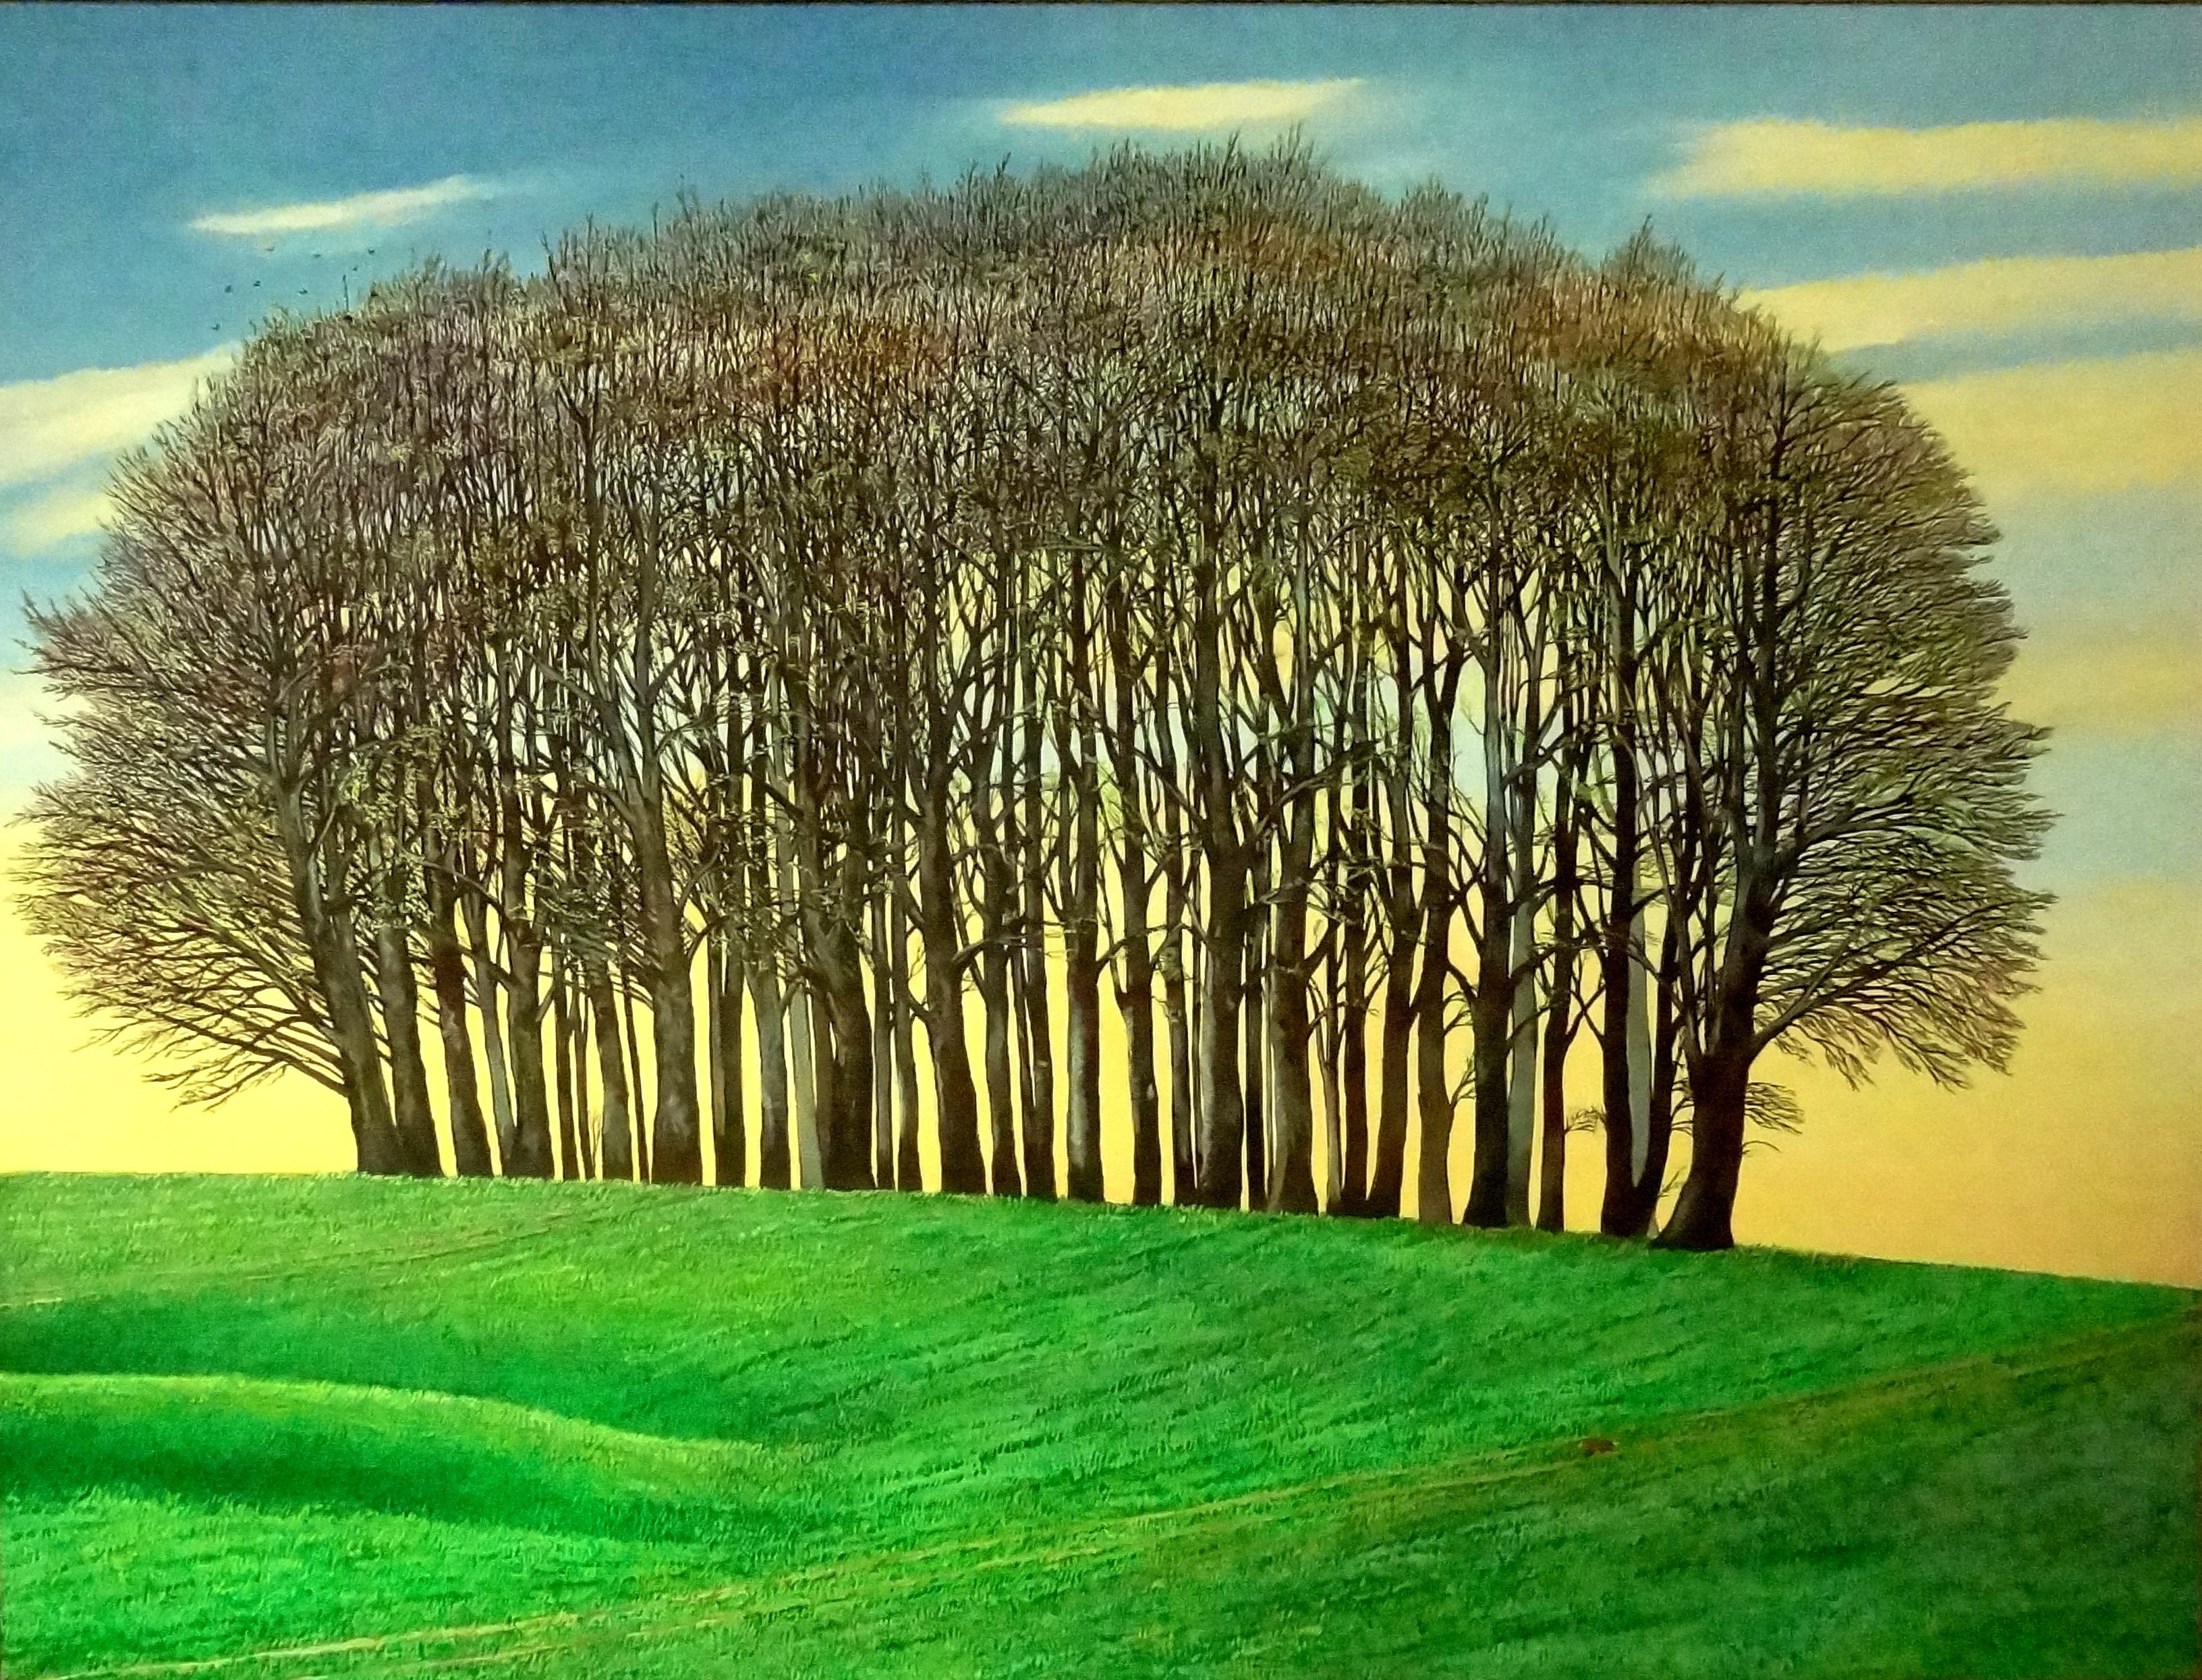 New Growth; Dorset Clump of Trees, Liz Wright